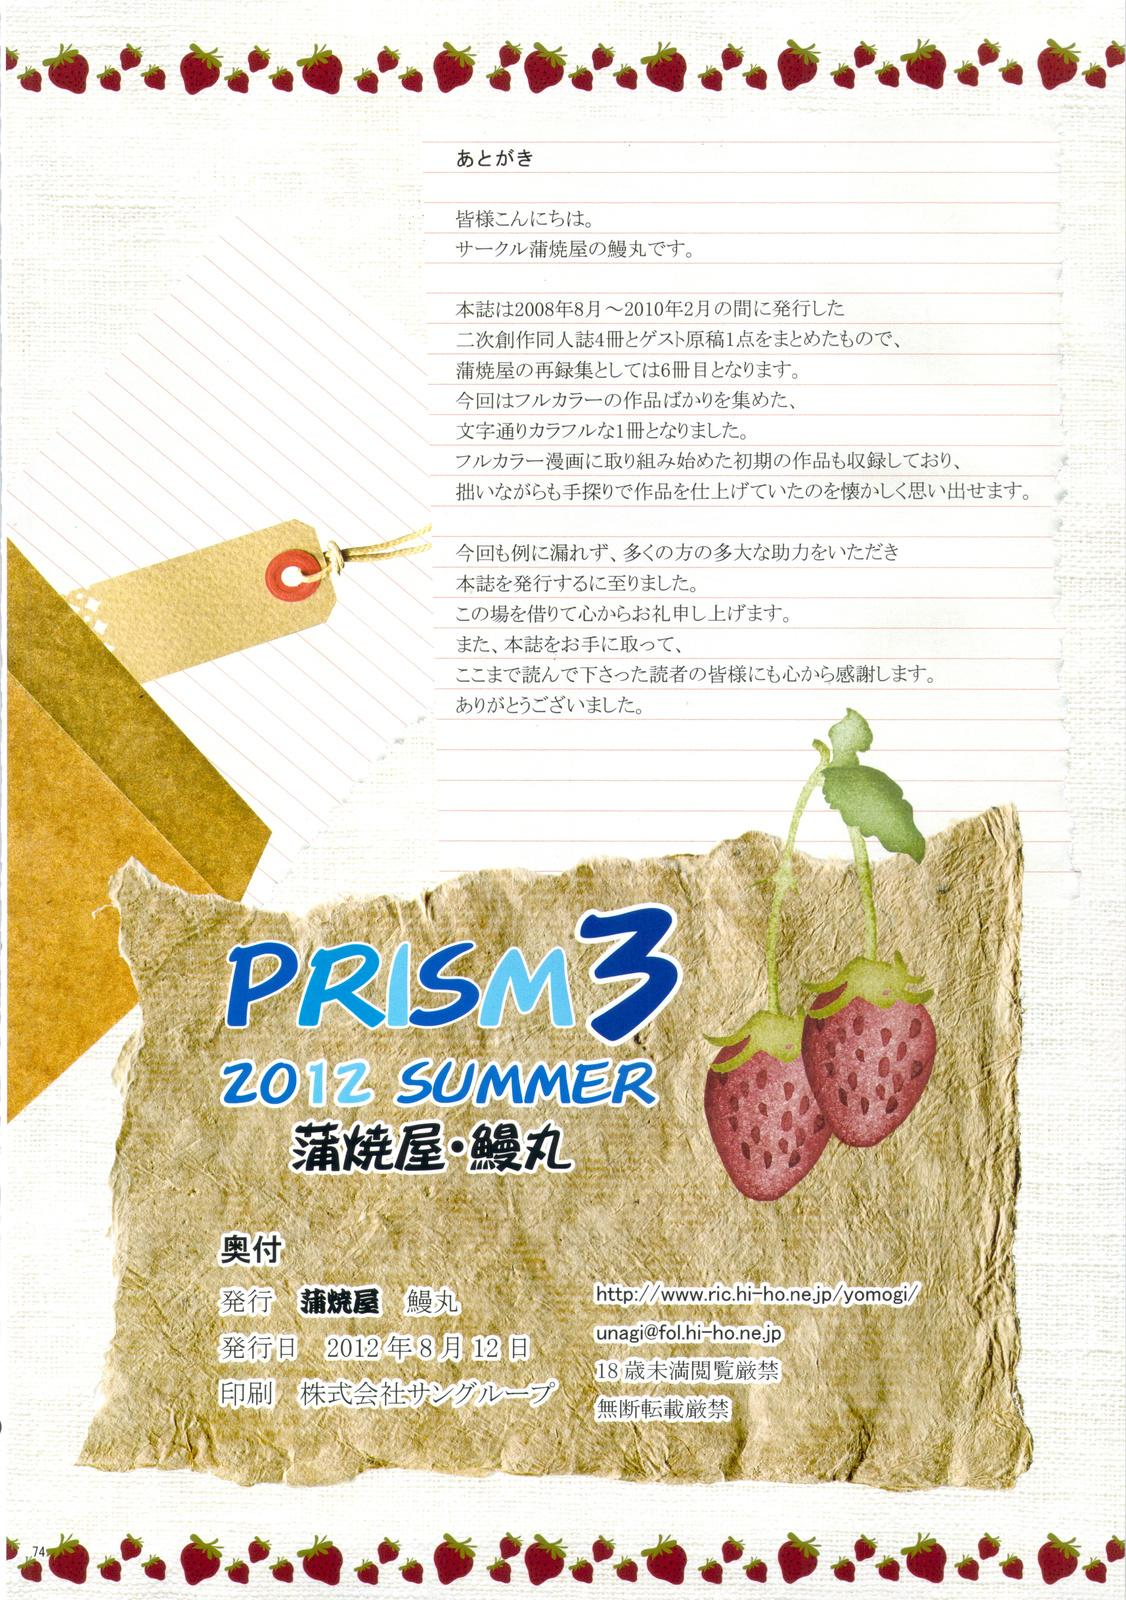 PRISM 3 - Kabayakiya Sariroku shuu 72